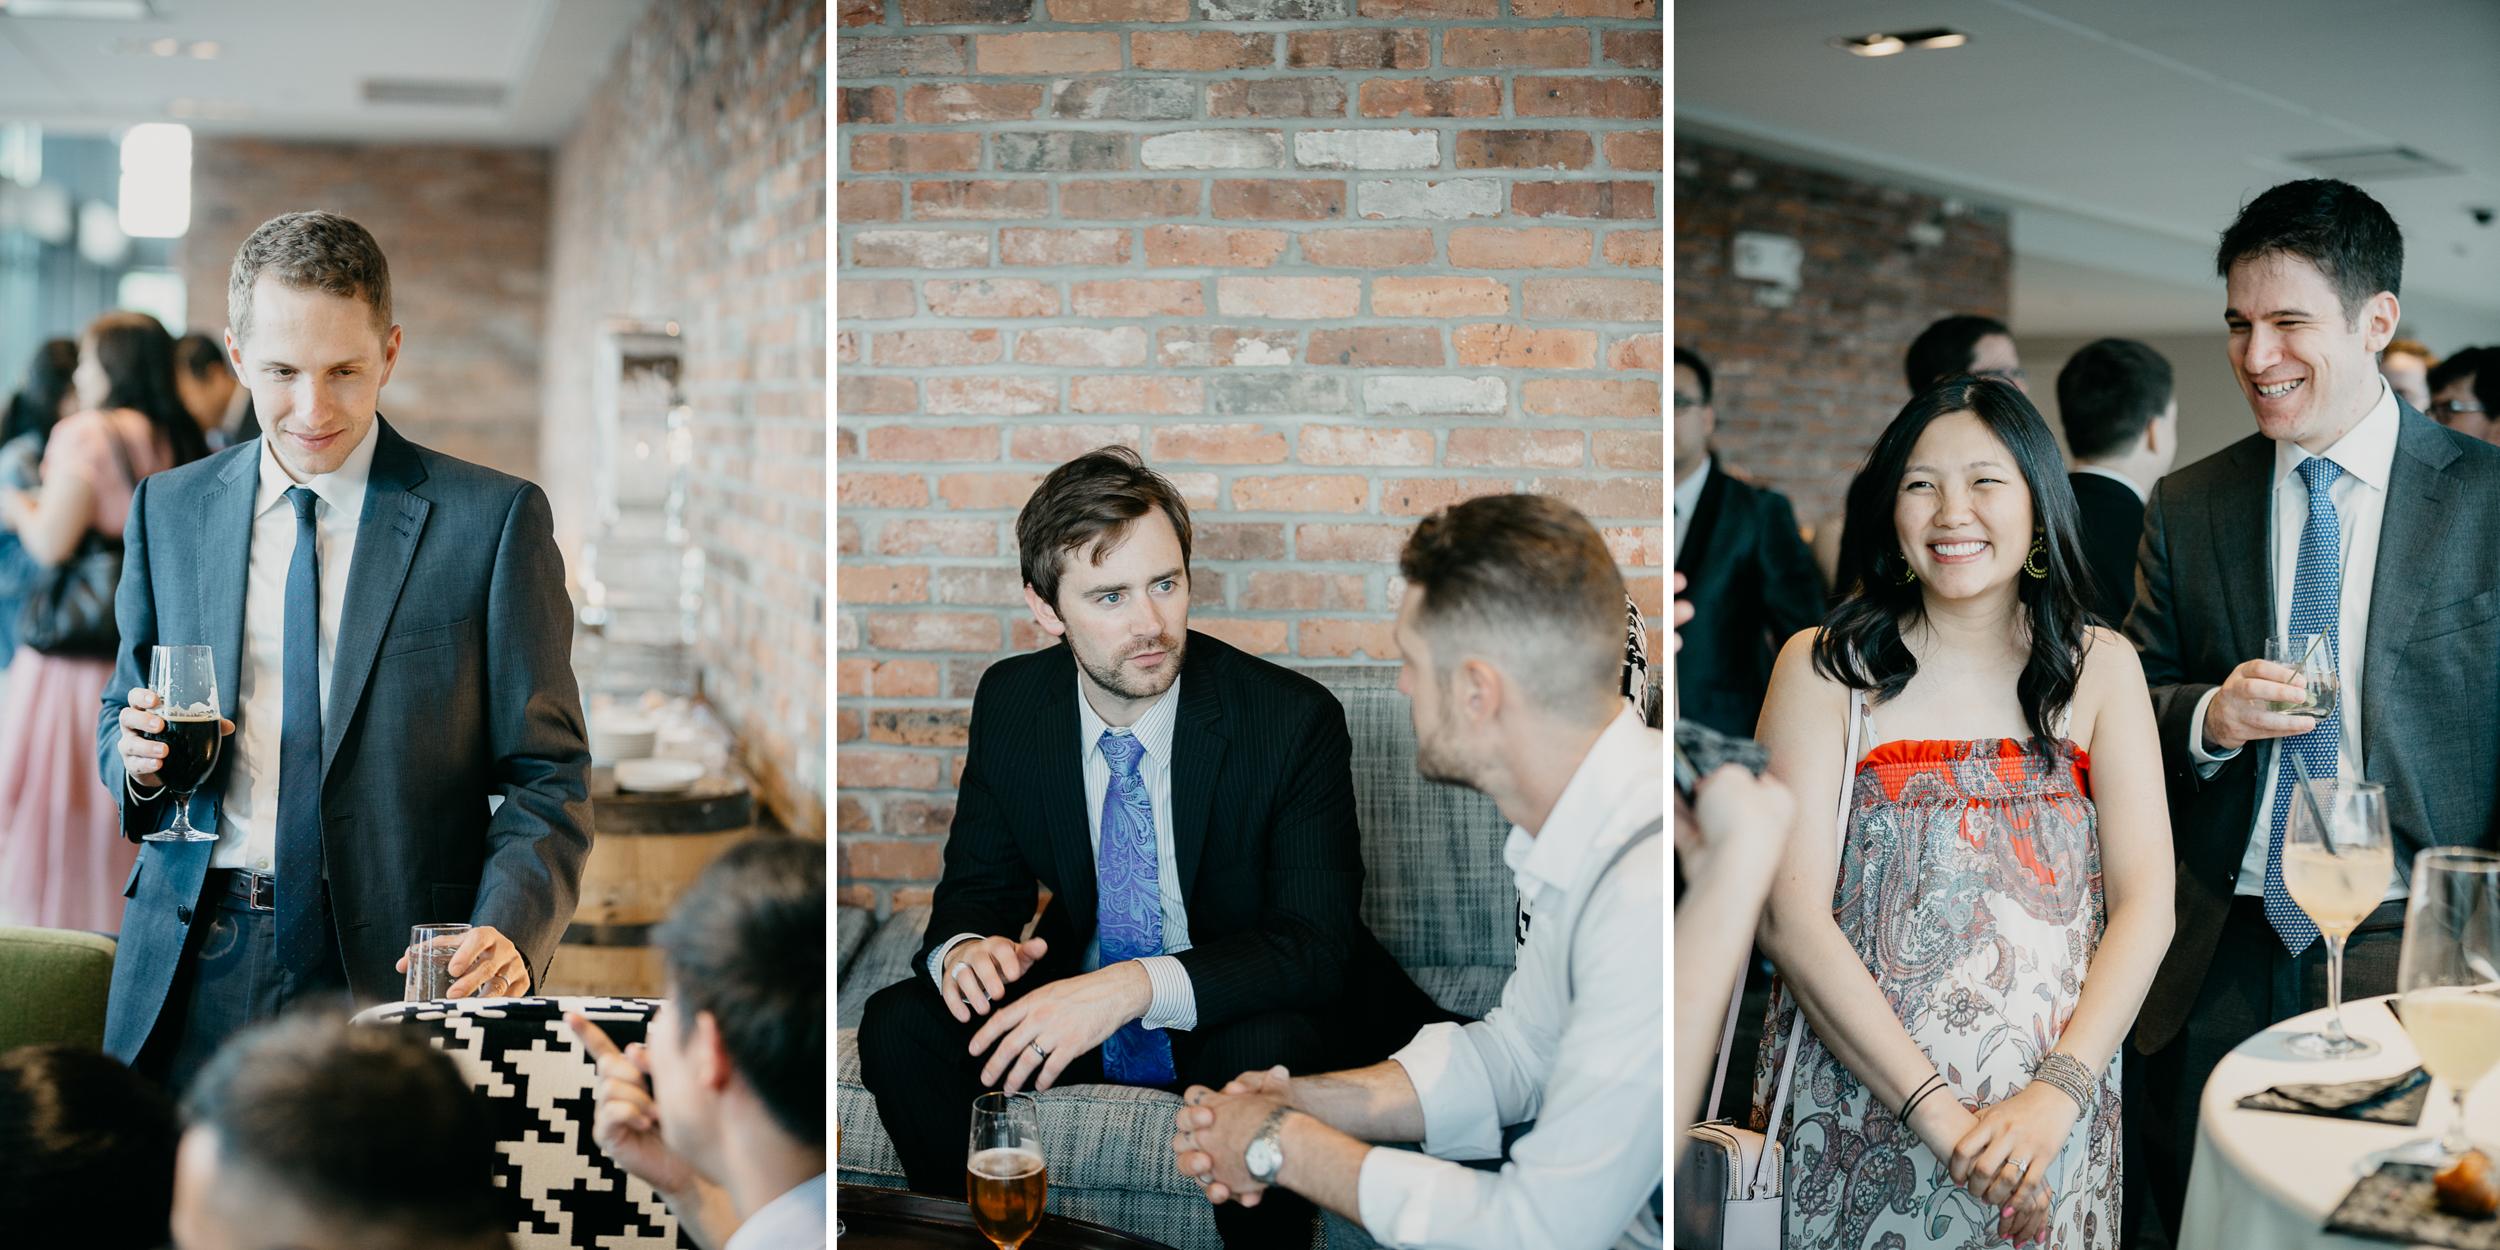 Mindy_Bo_Boston_Wedding_MIT_HotelCommonwealth_021.jpg